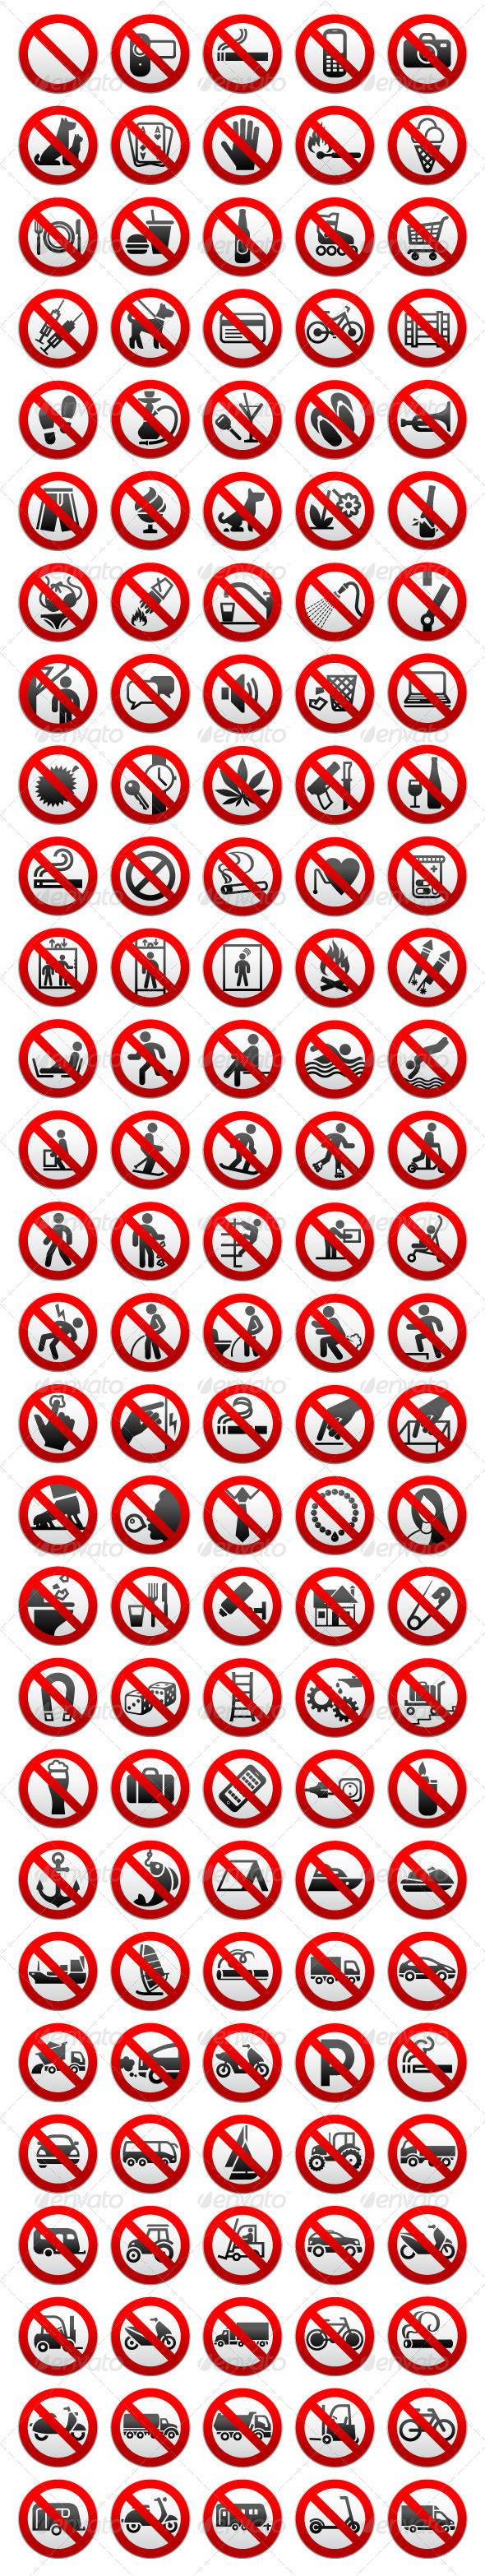 140 Prohibited Symbols - Decorative Symbols Decorative